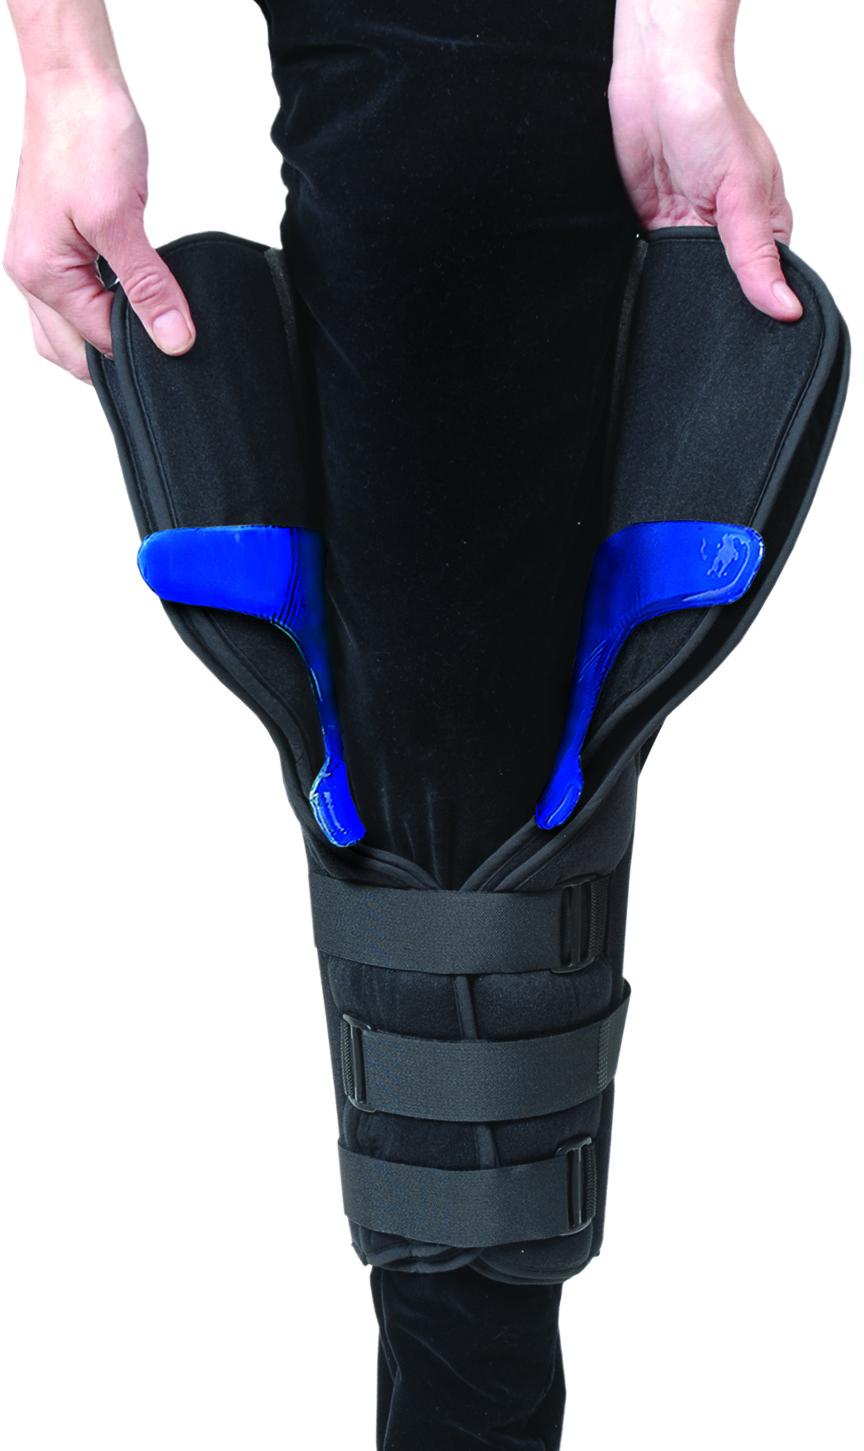 universal-3-panel-knee-immobilizer-14-200010-ossur-os378498-2.jpg